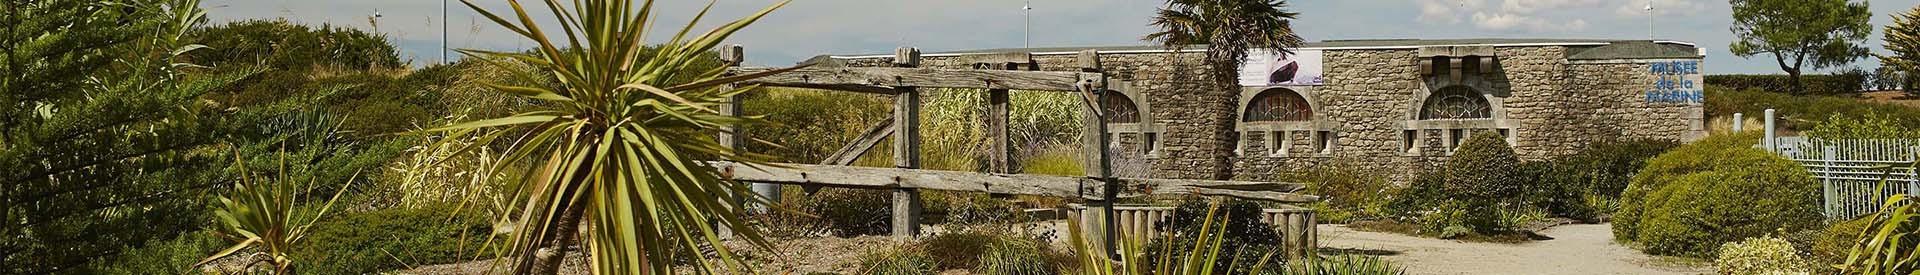 parc-jardin-littoral-st-brevin-20-132